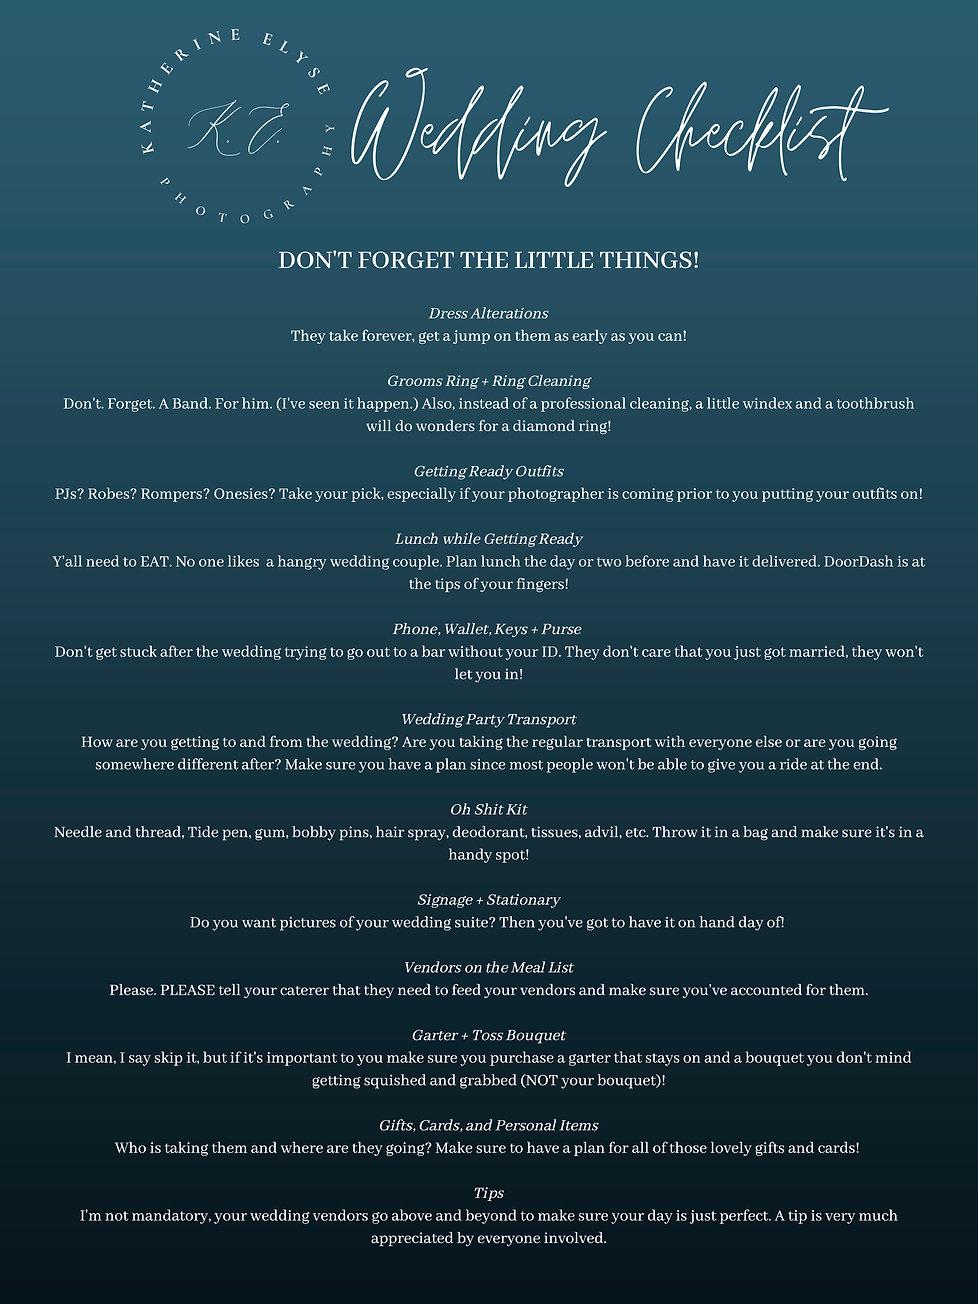 Wedding Checklist 2.jpg